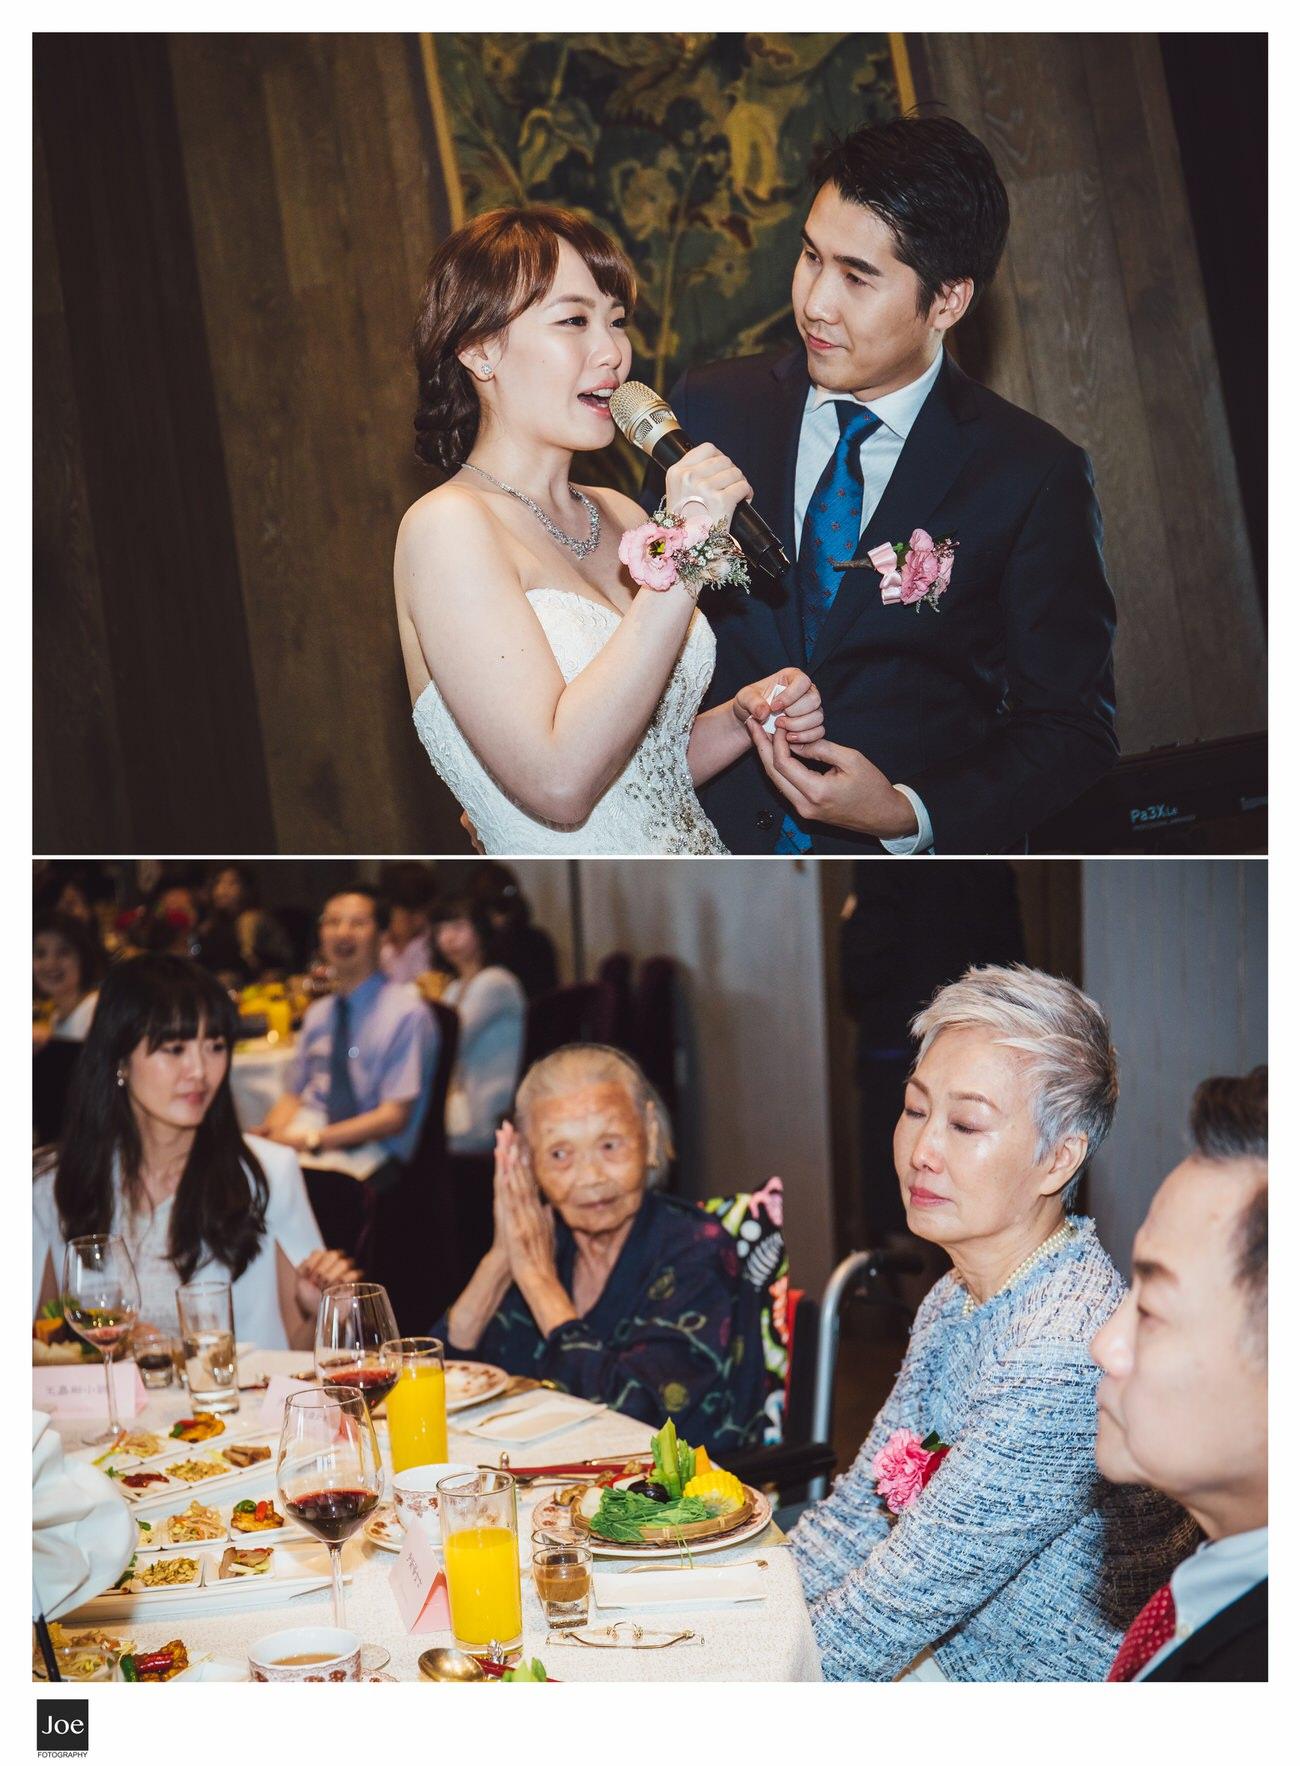 joe-fotography-wedding-photo-palais-de-chine-hotel-030.jpg